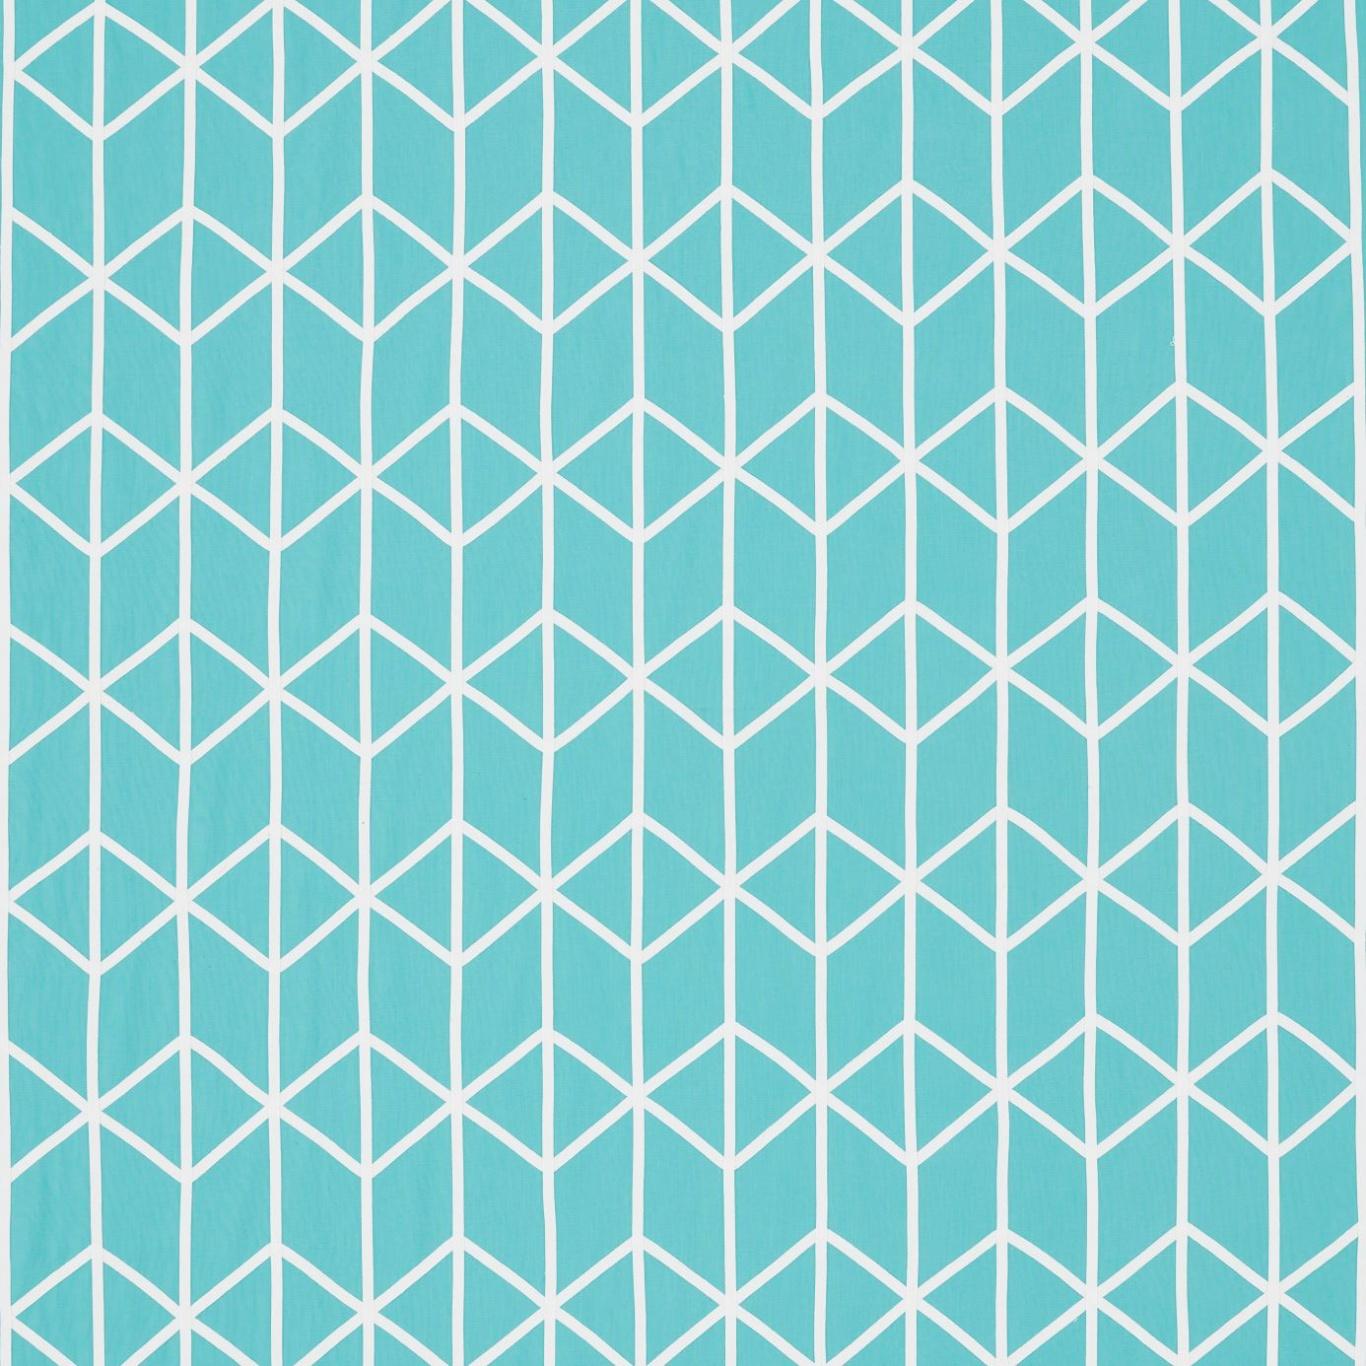 Image of Scion Nendo Marine Curtain Fabric 131819